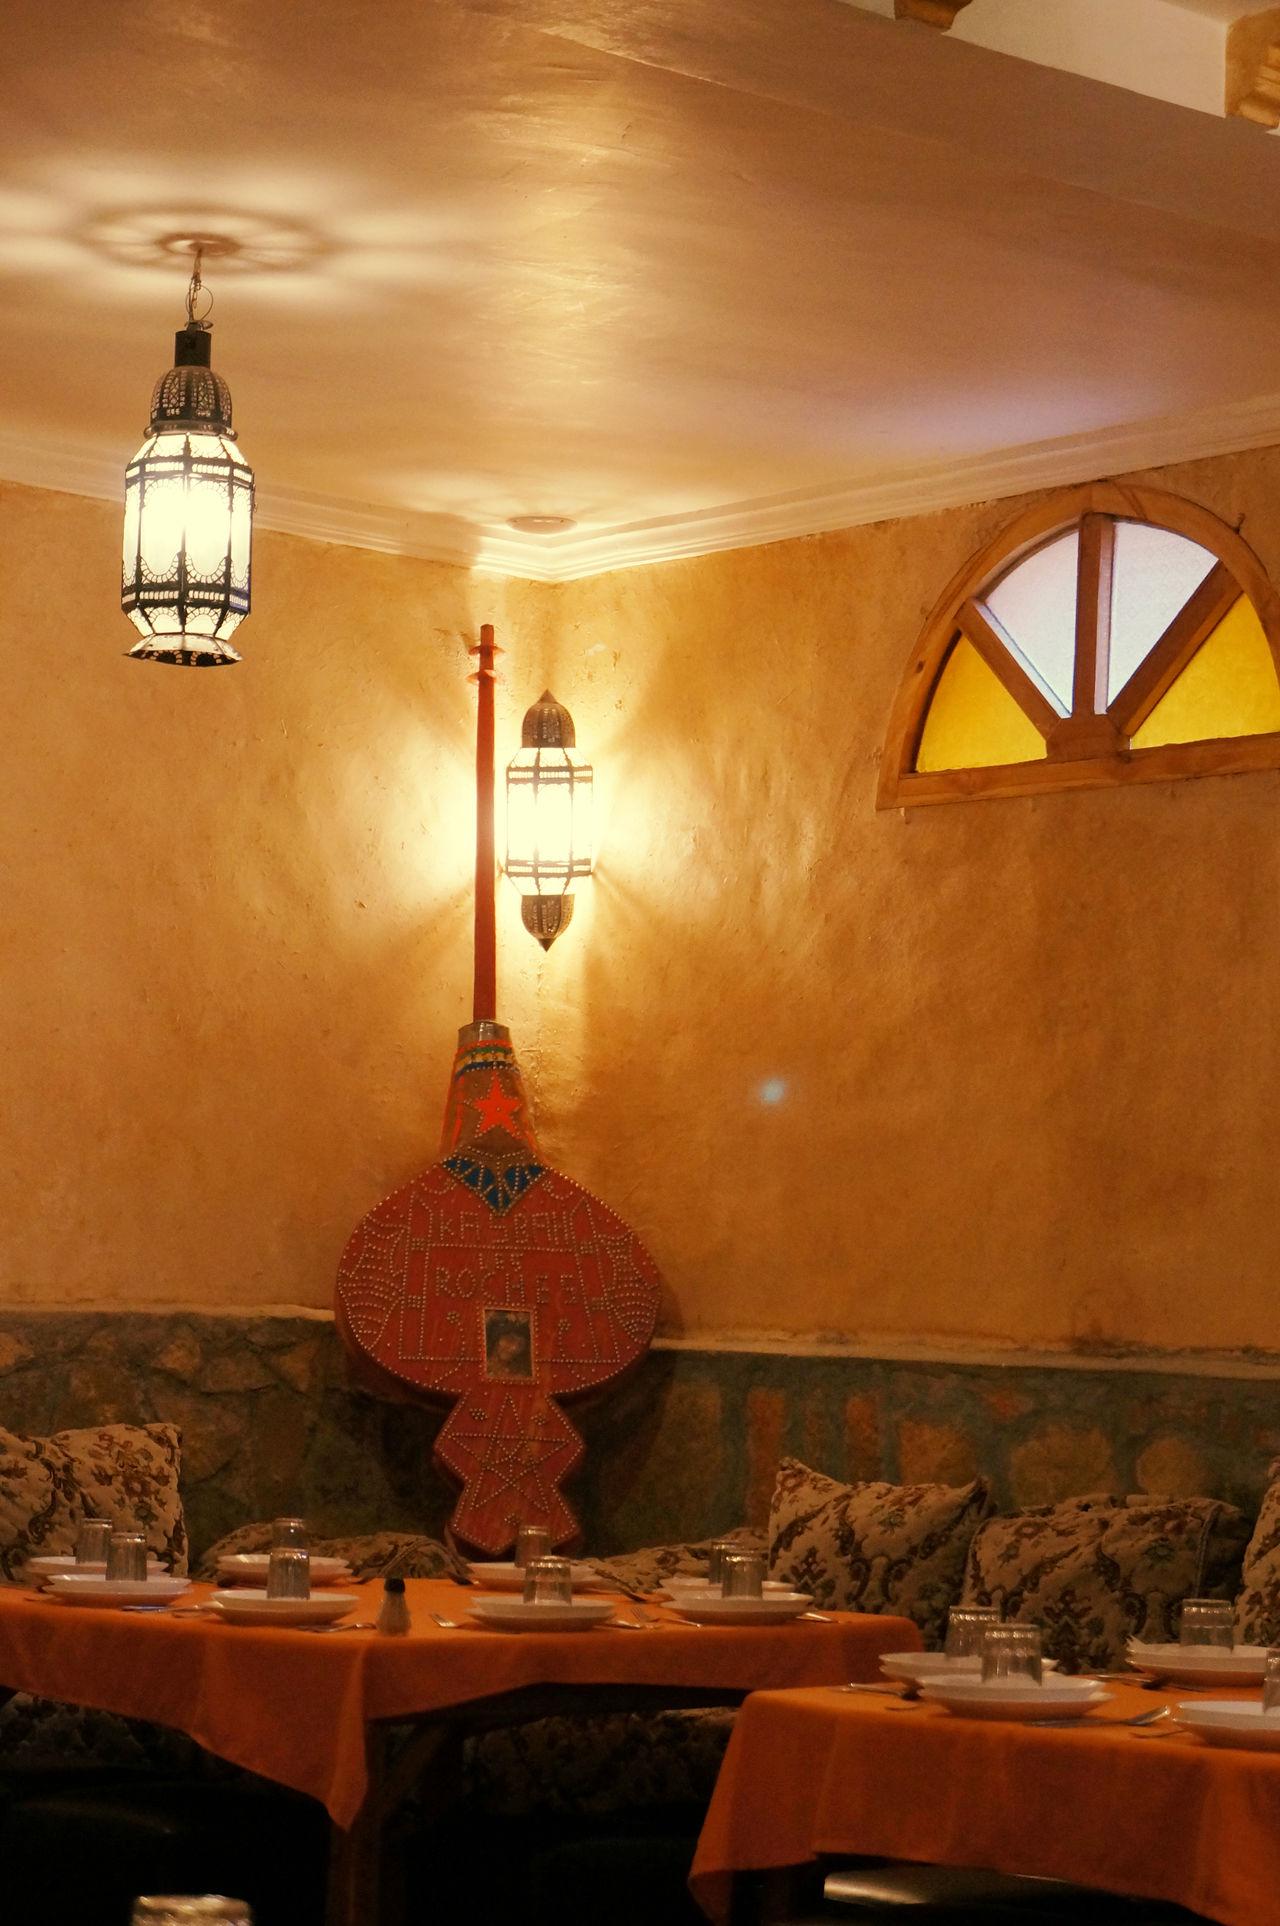 2012 Architecture Asian  Dinner Indoors  Lamp Light Lighting Equipment Lnstrument Morocco Pendant Light Restaurant Room Stendglass Window アジア モロッコ ランプ レストラン 楽器